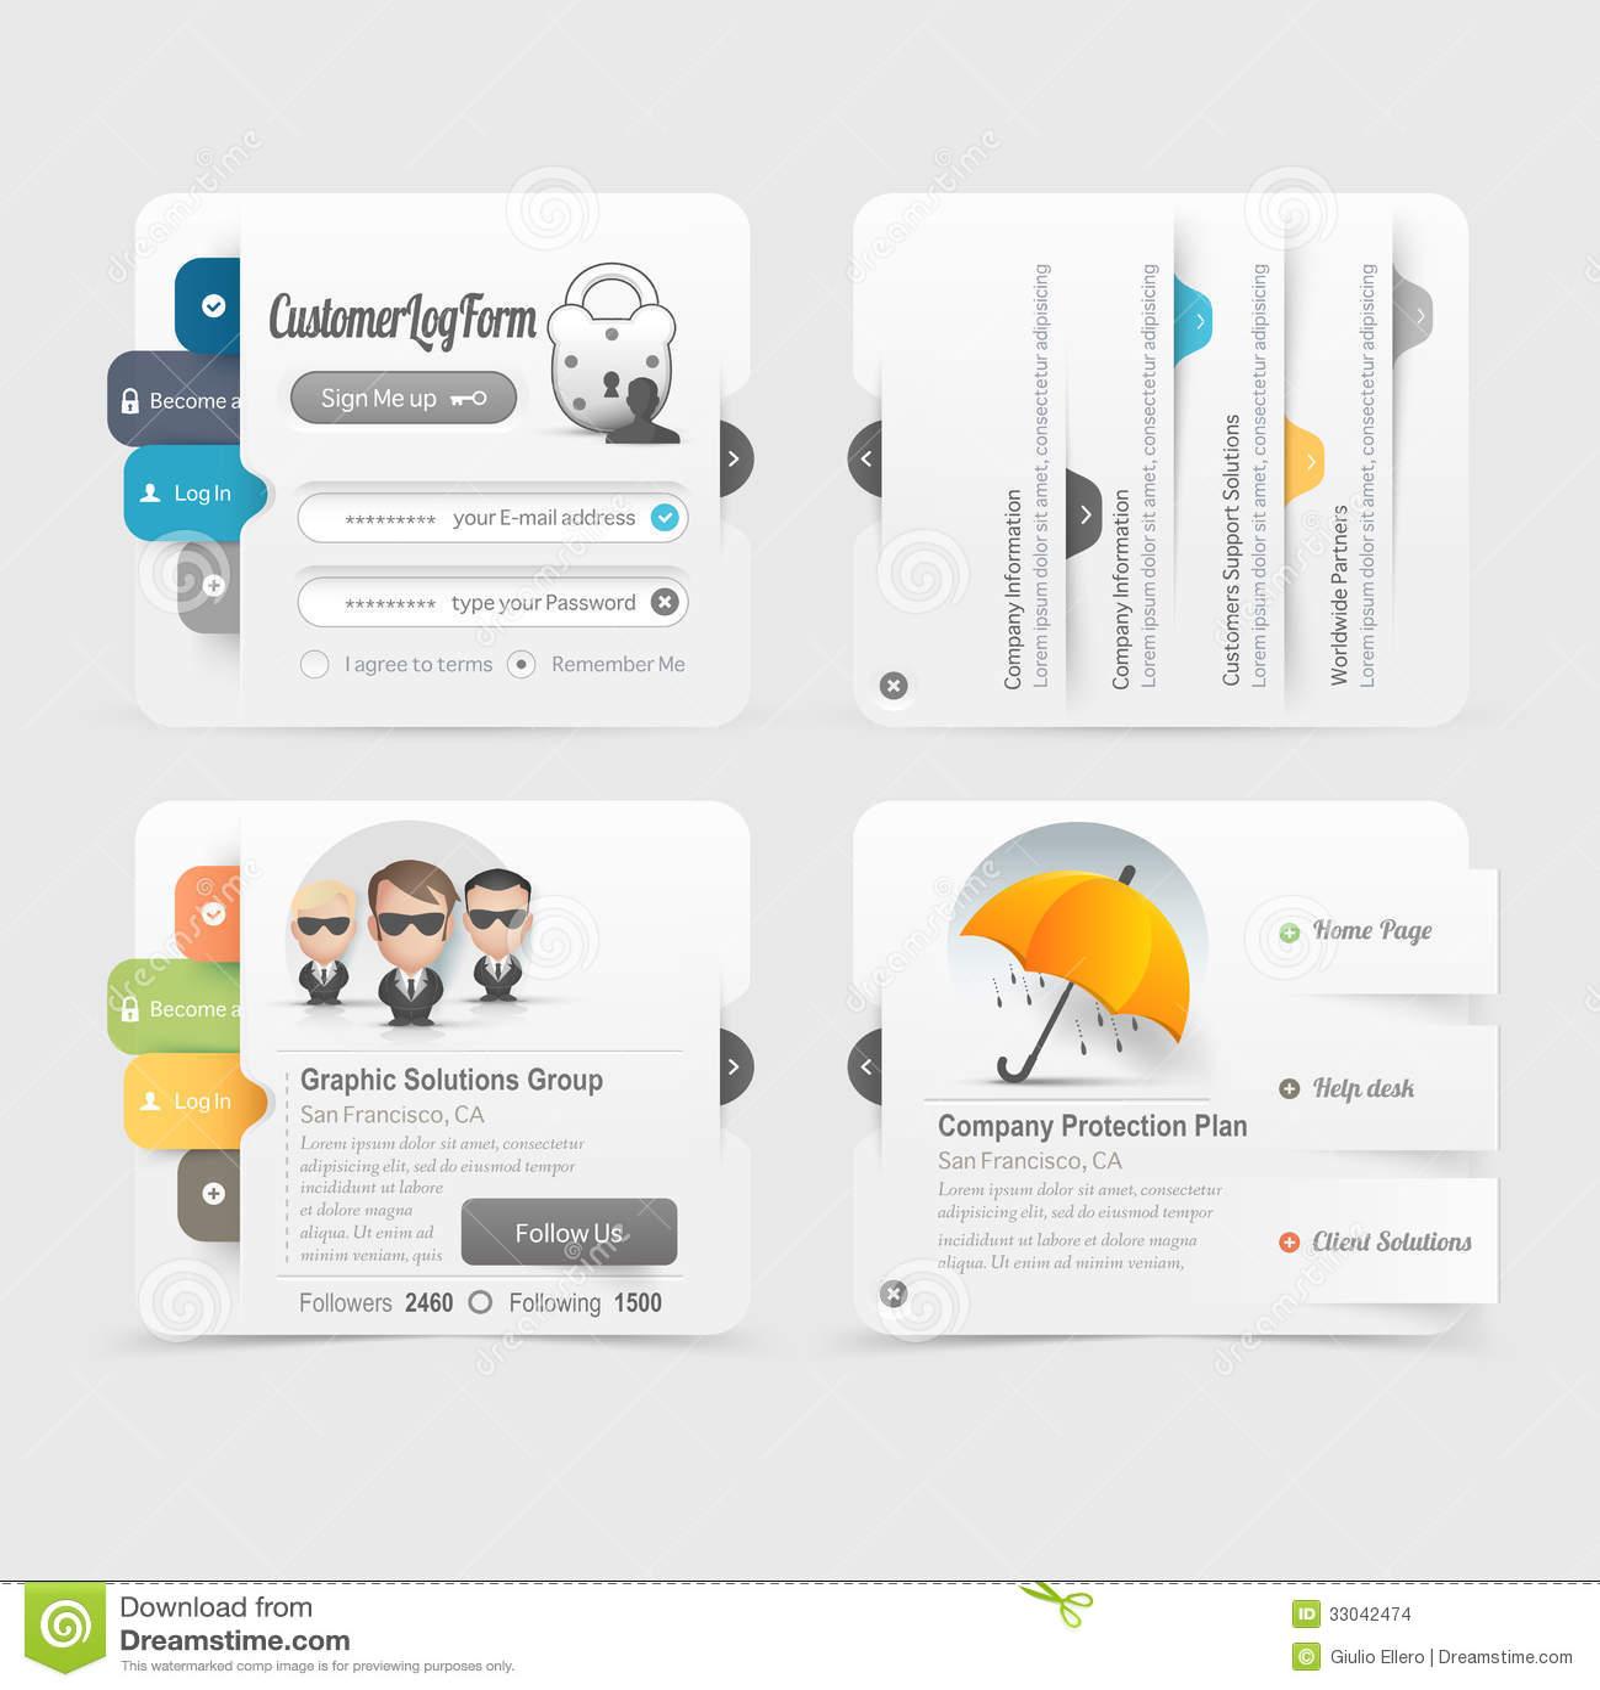 Business Web Site Template Design Menu Navigation Elements With